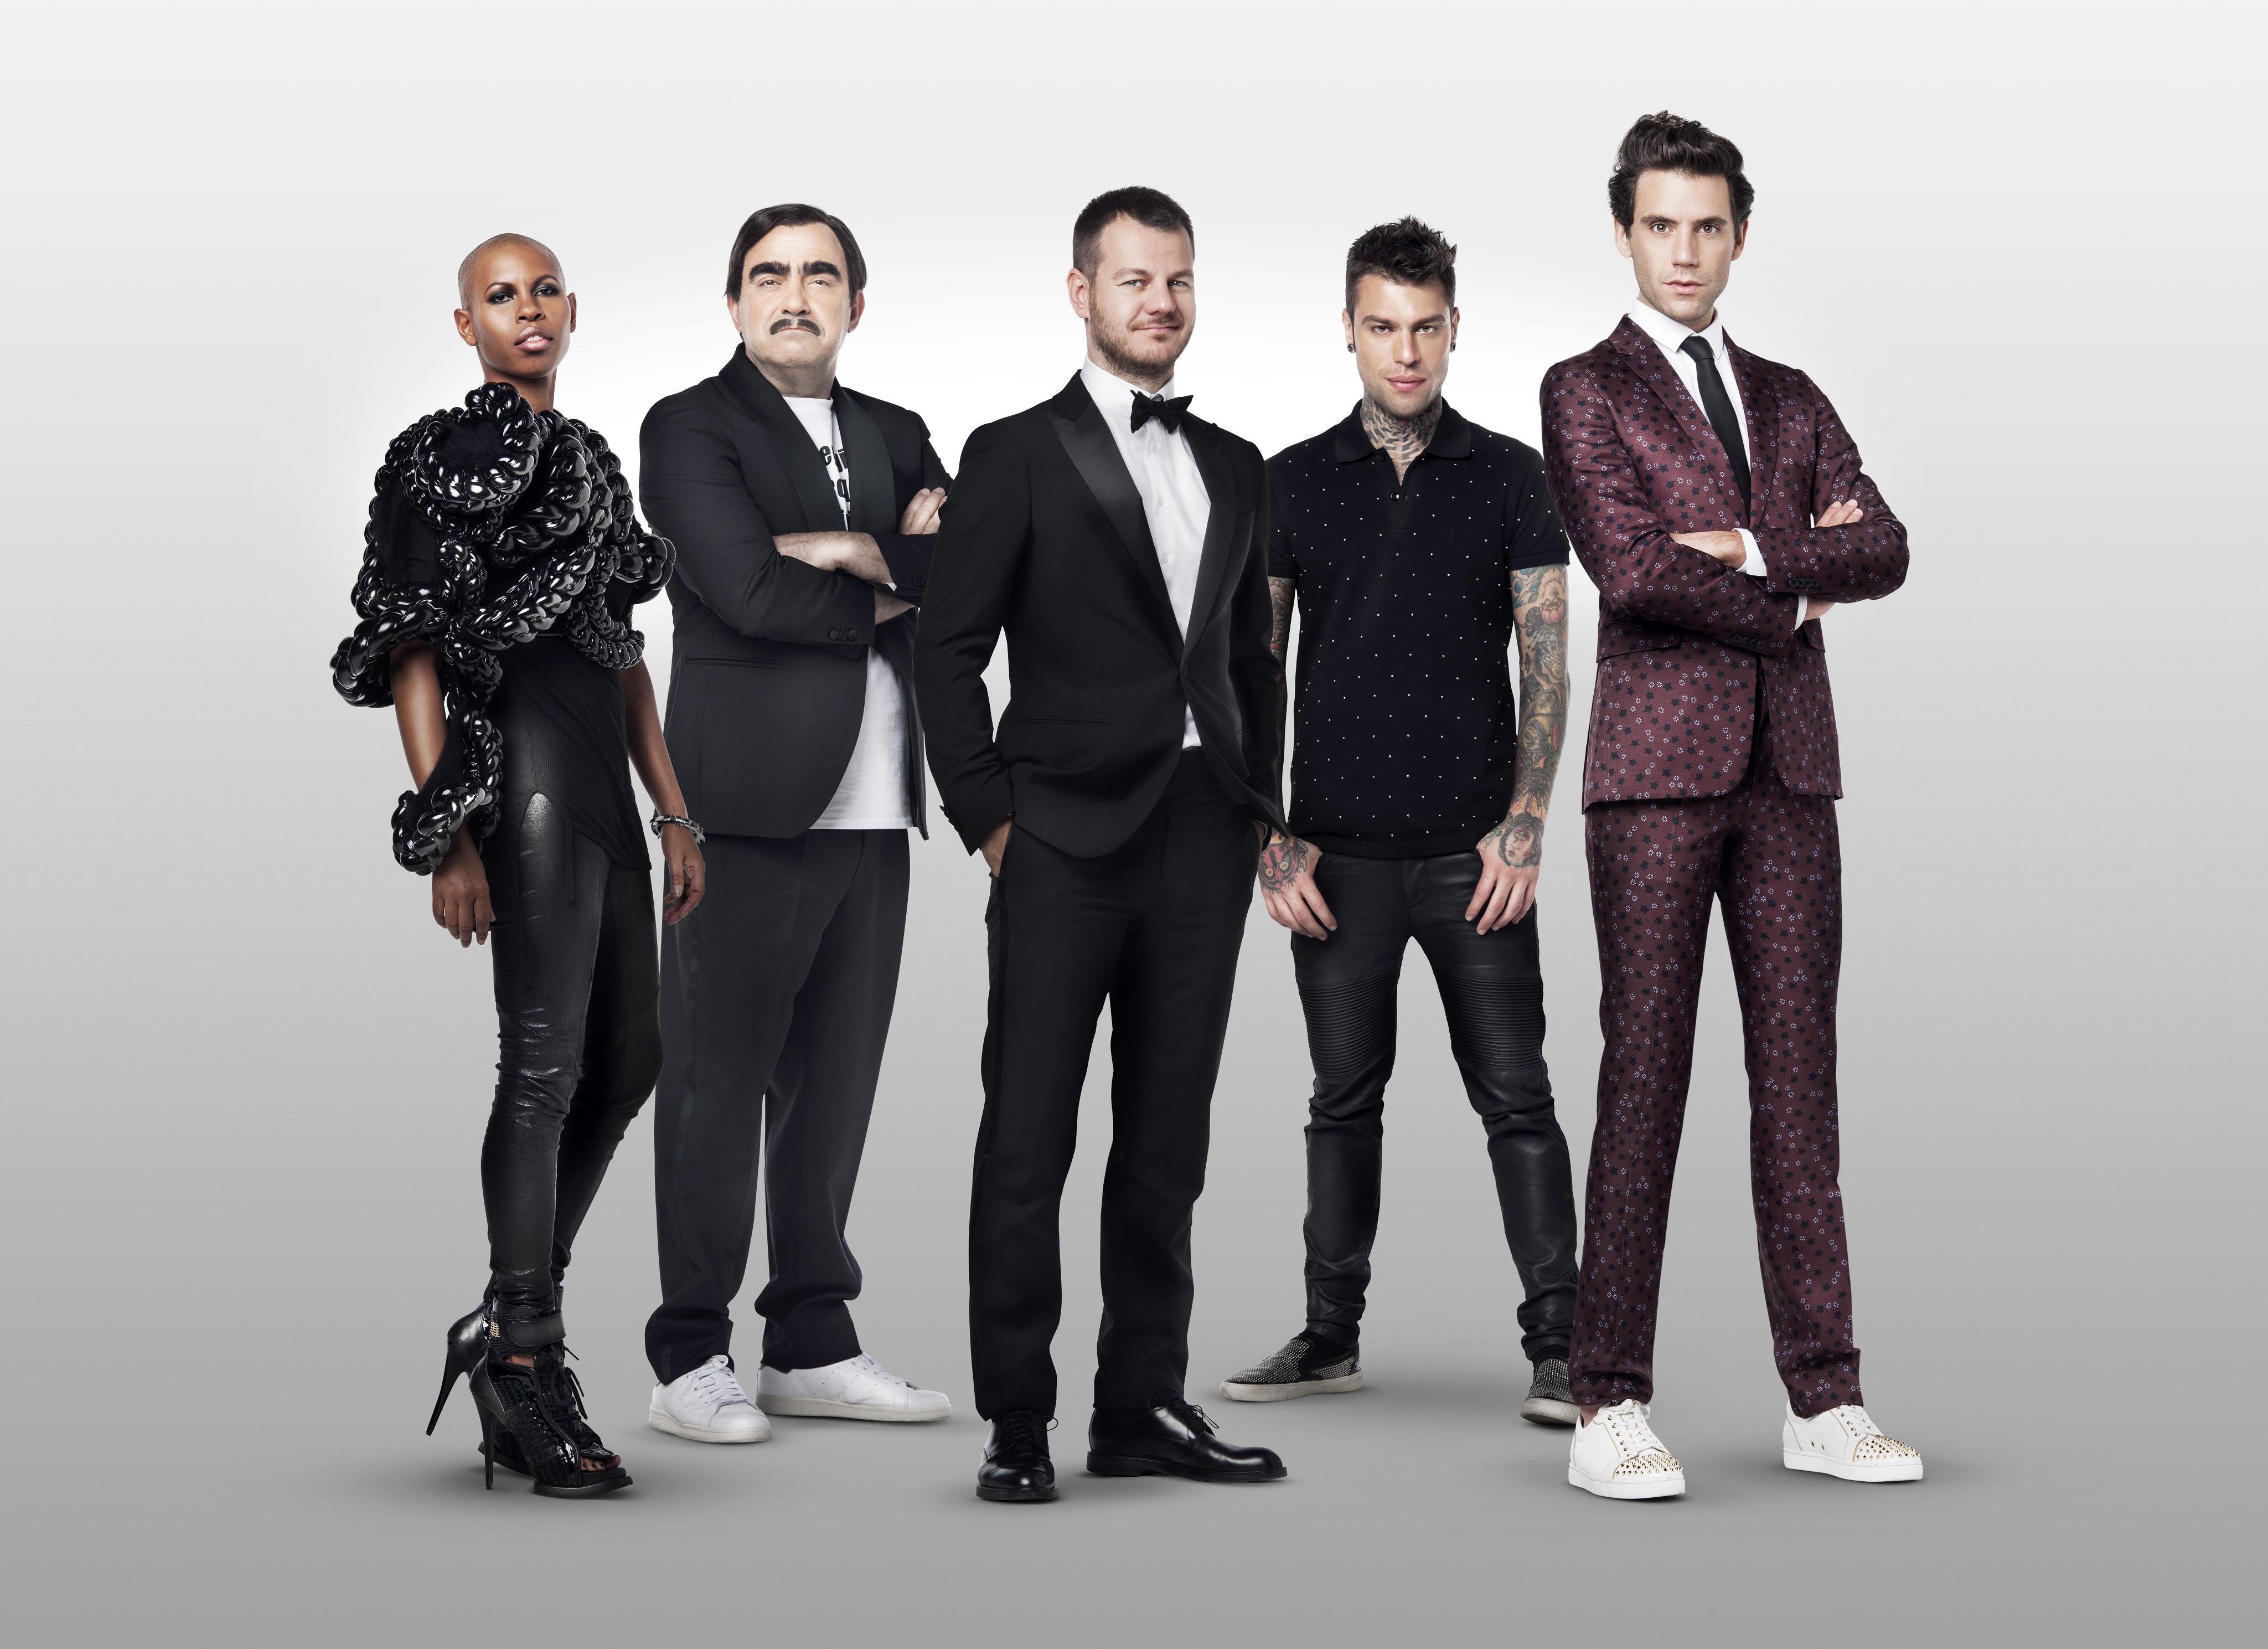 X Factor 10, svelati i nuovi giudici